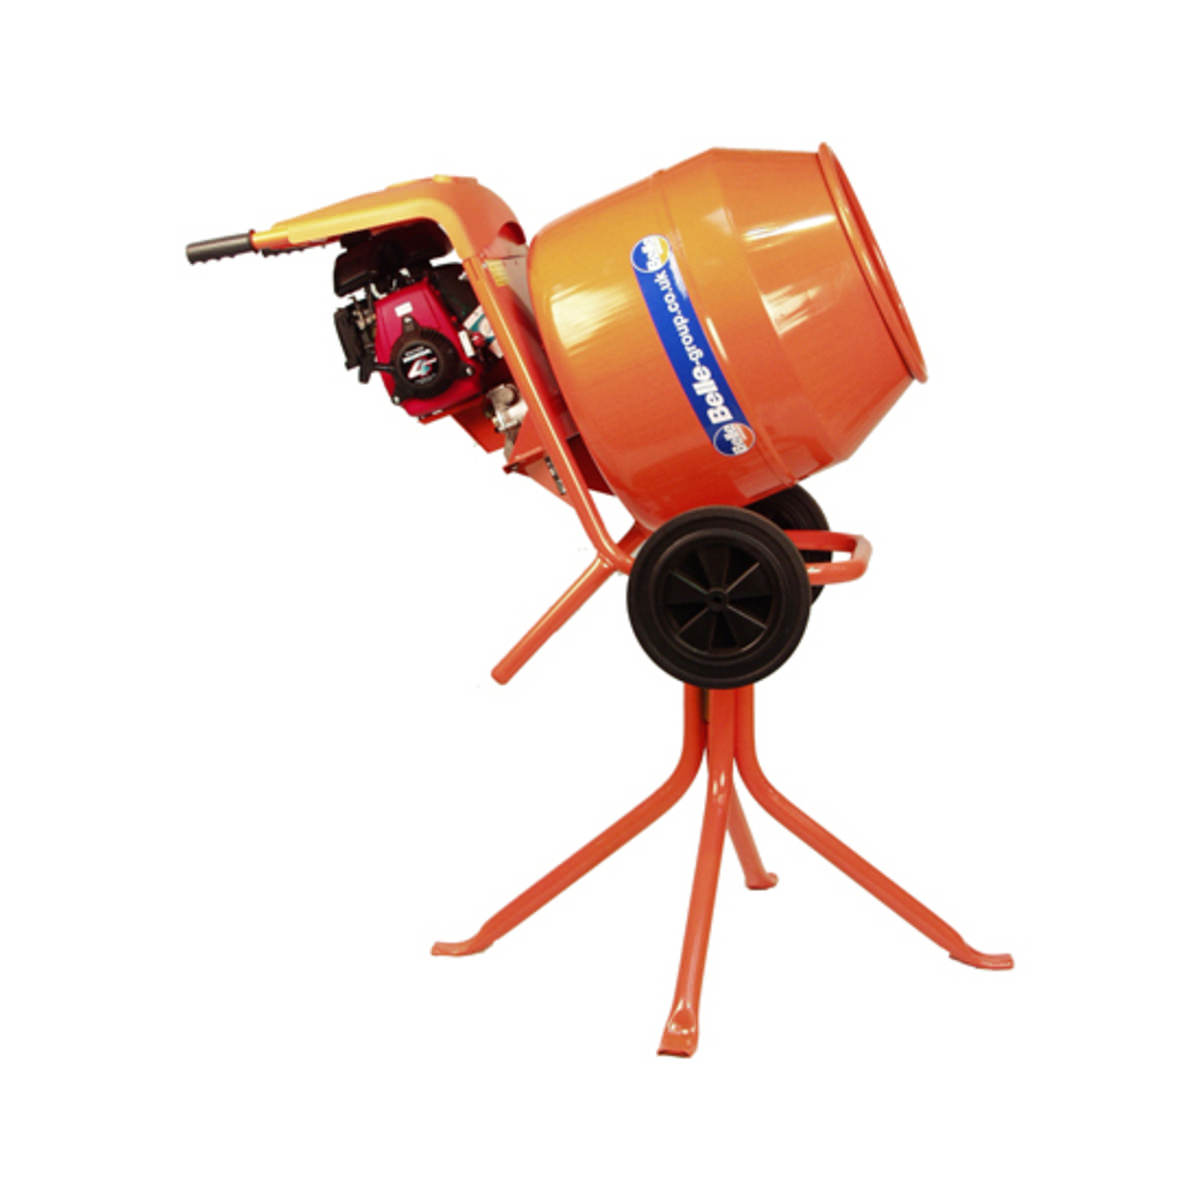 Petrol & Electric 3/2 Mixers